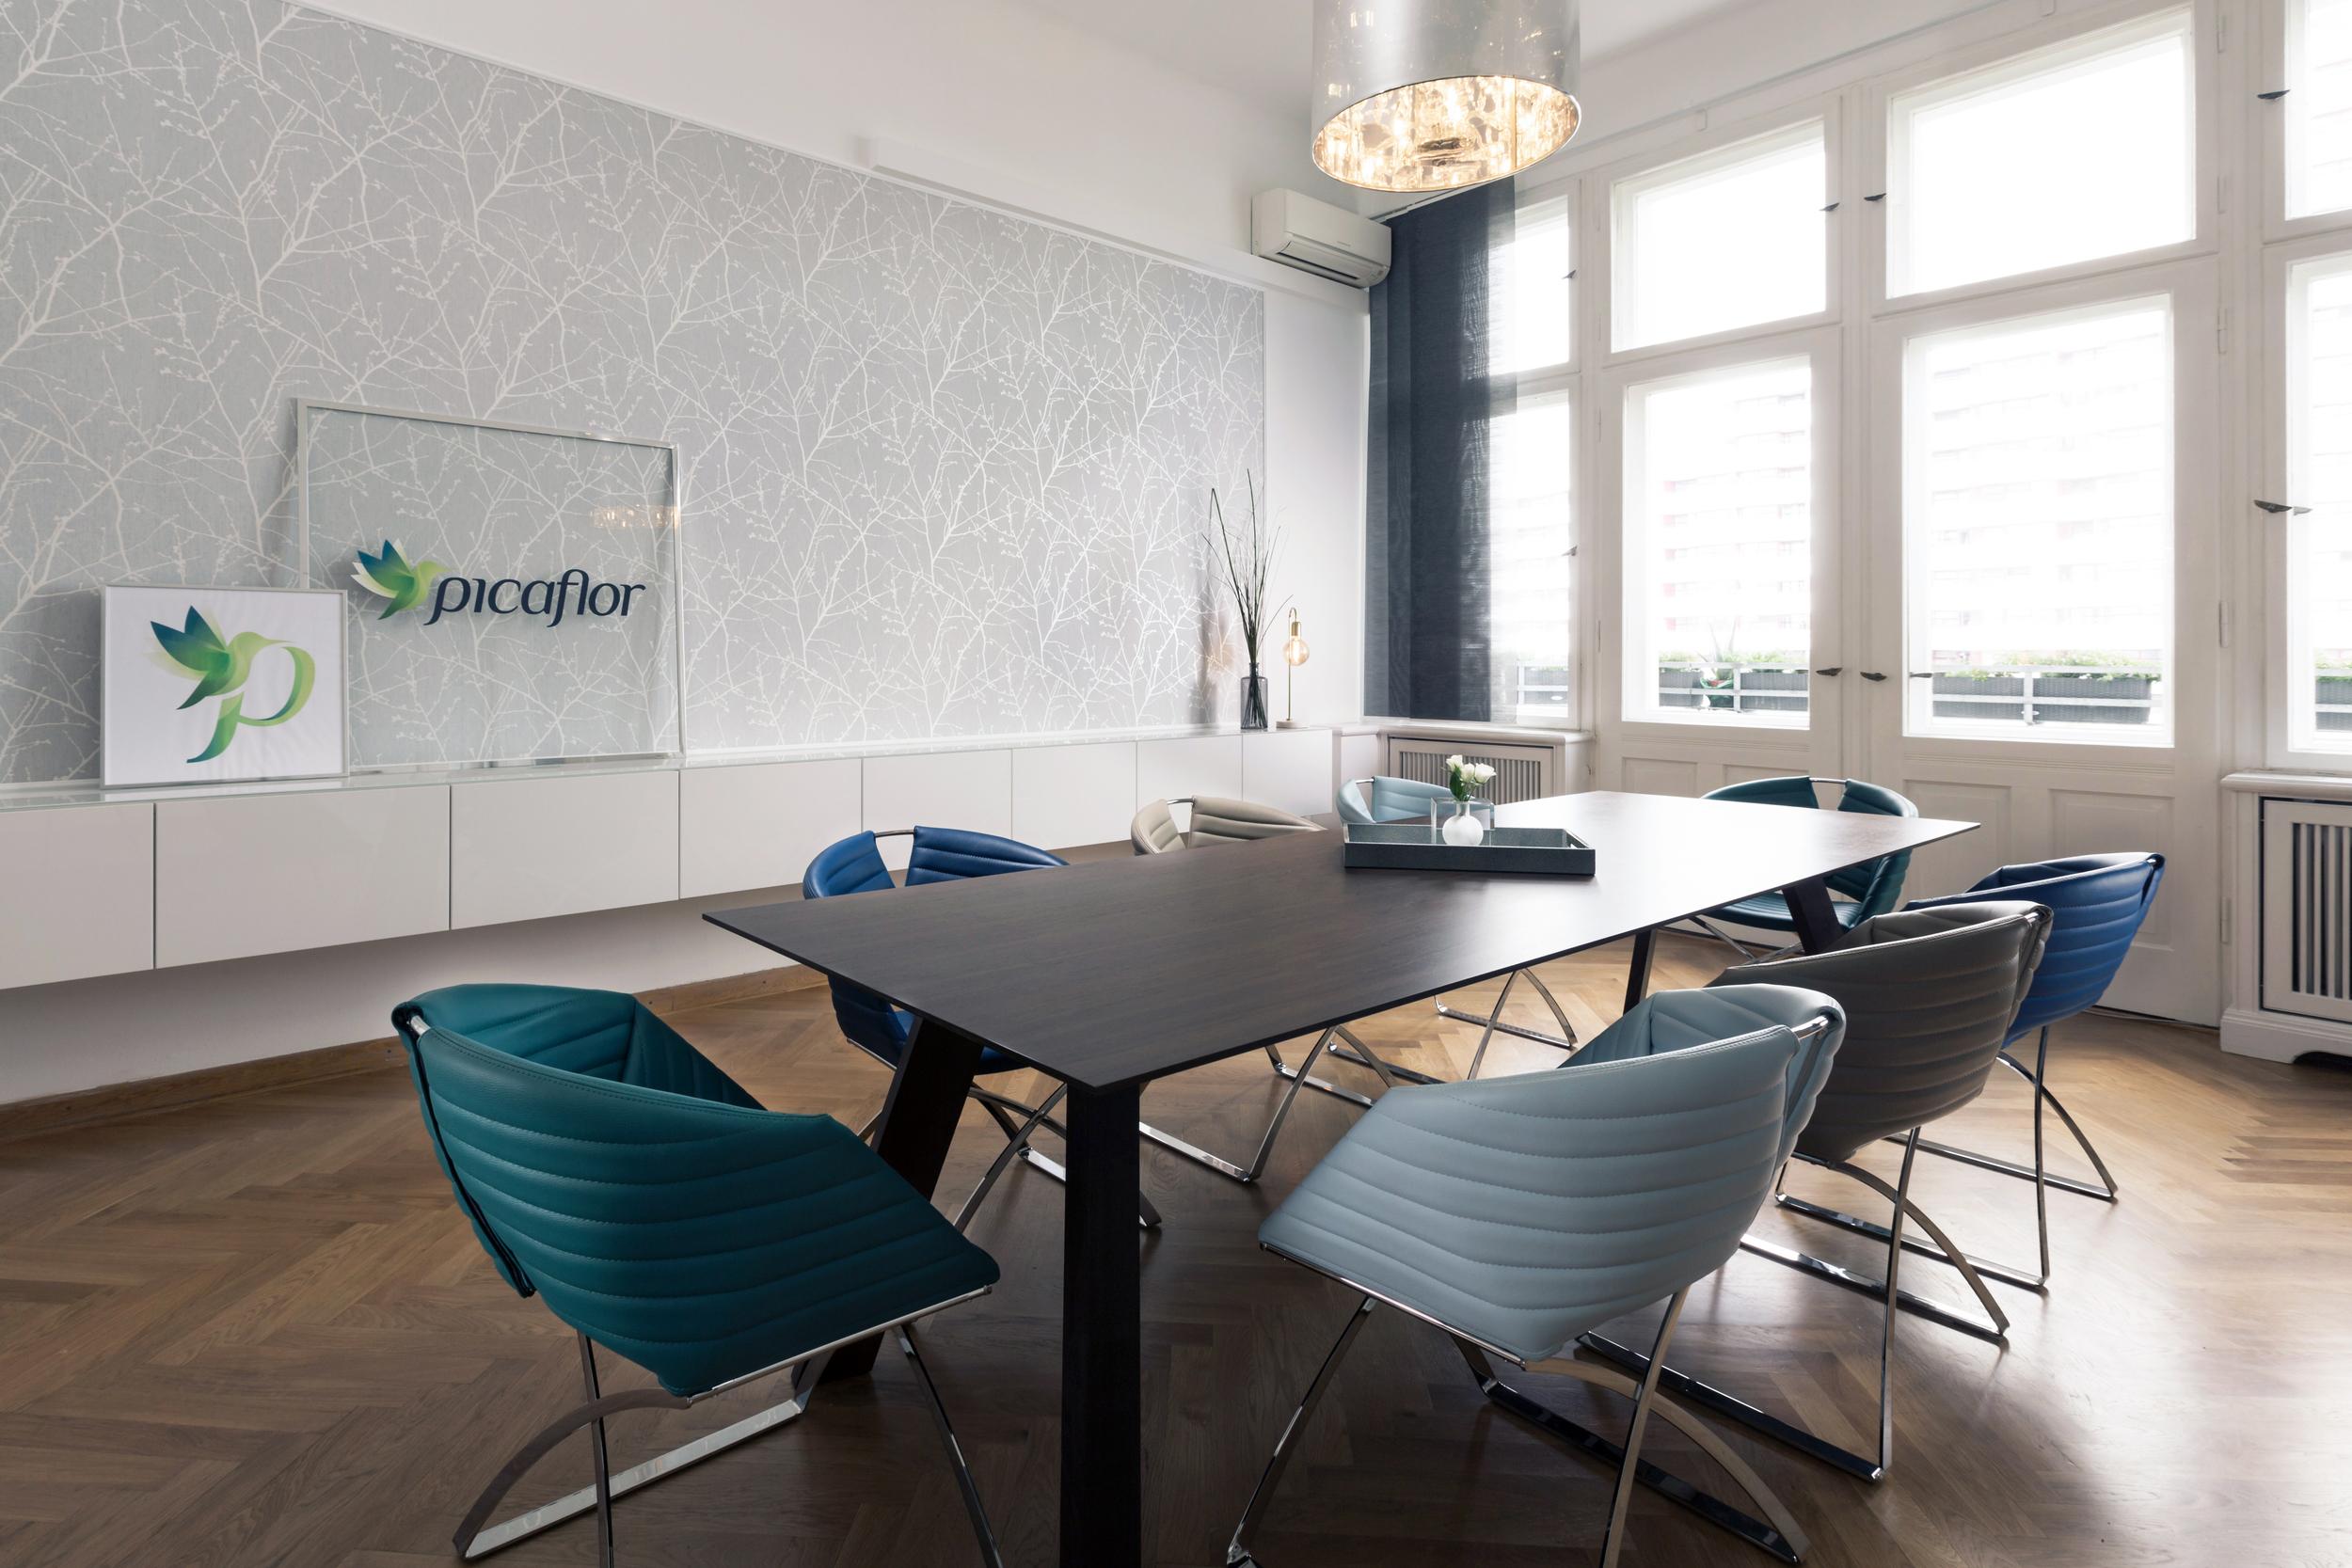 re-vamp_Picaflor_Büro_Konferenzraum.jpg